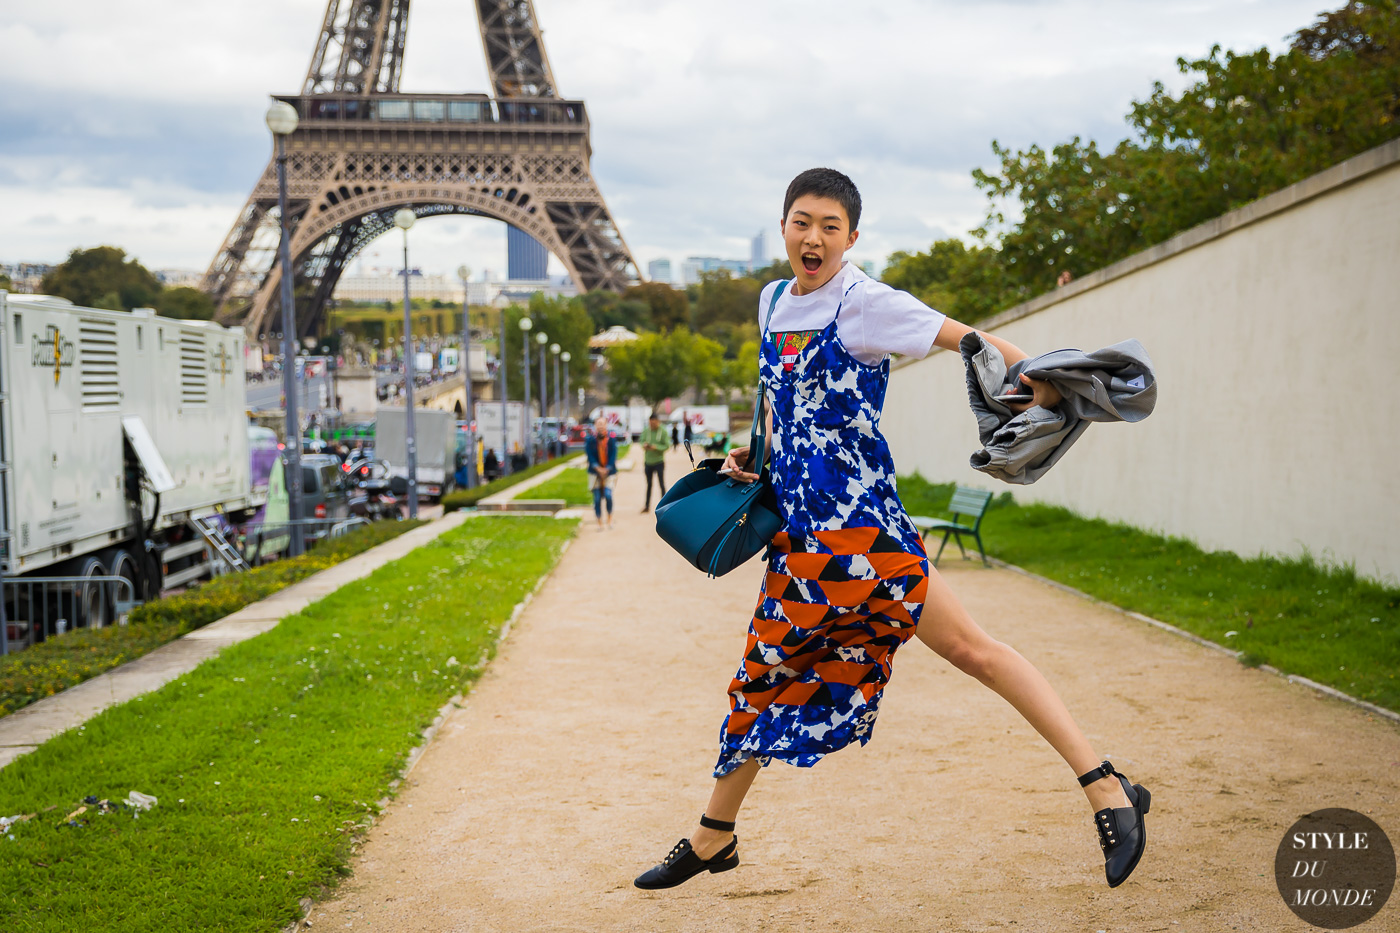 Sohyun Jung (ph: Style du Monde)